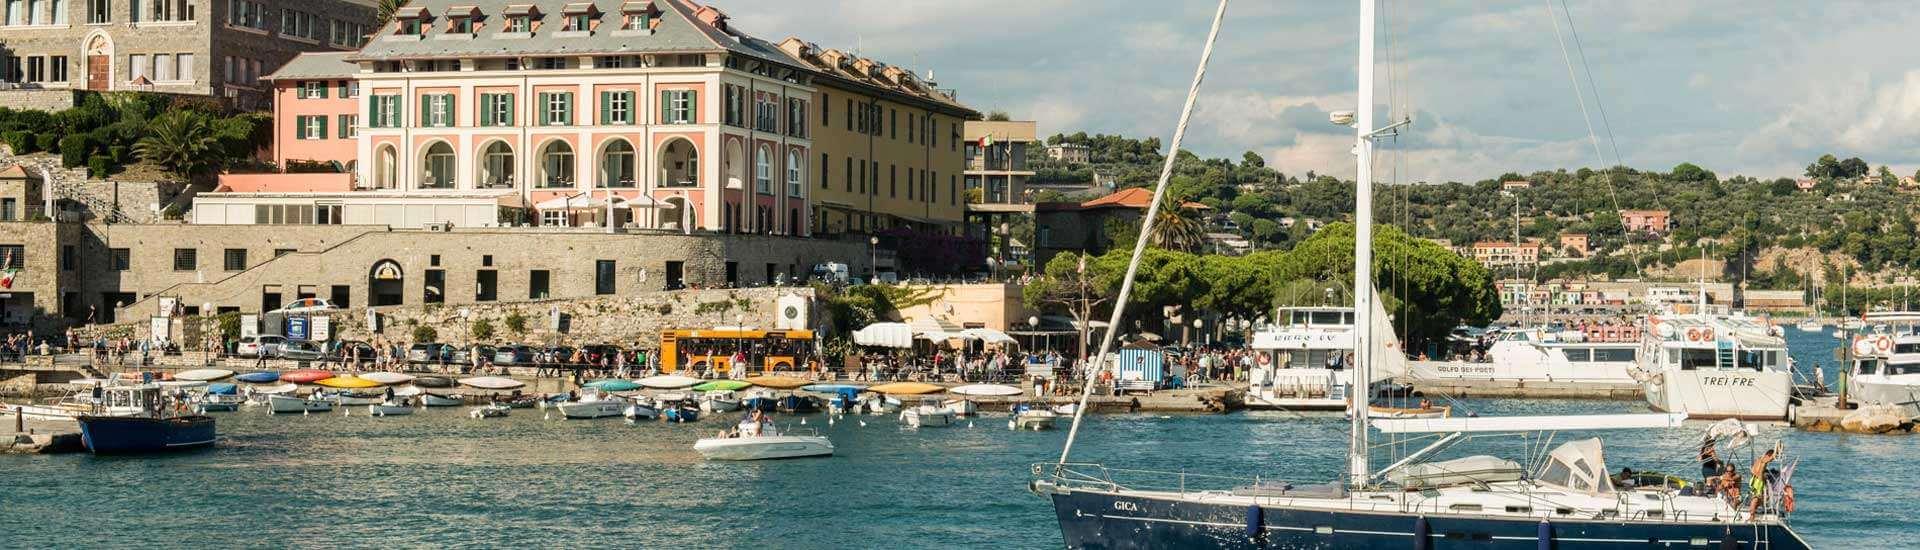 Grand Hotel Portovenere: spring grand reopening